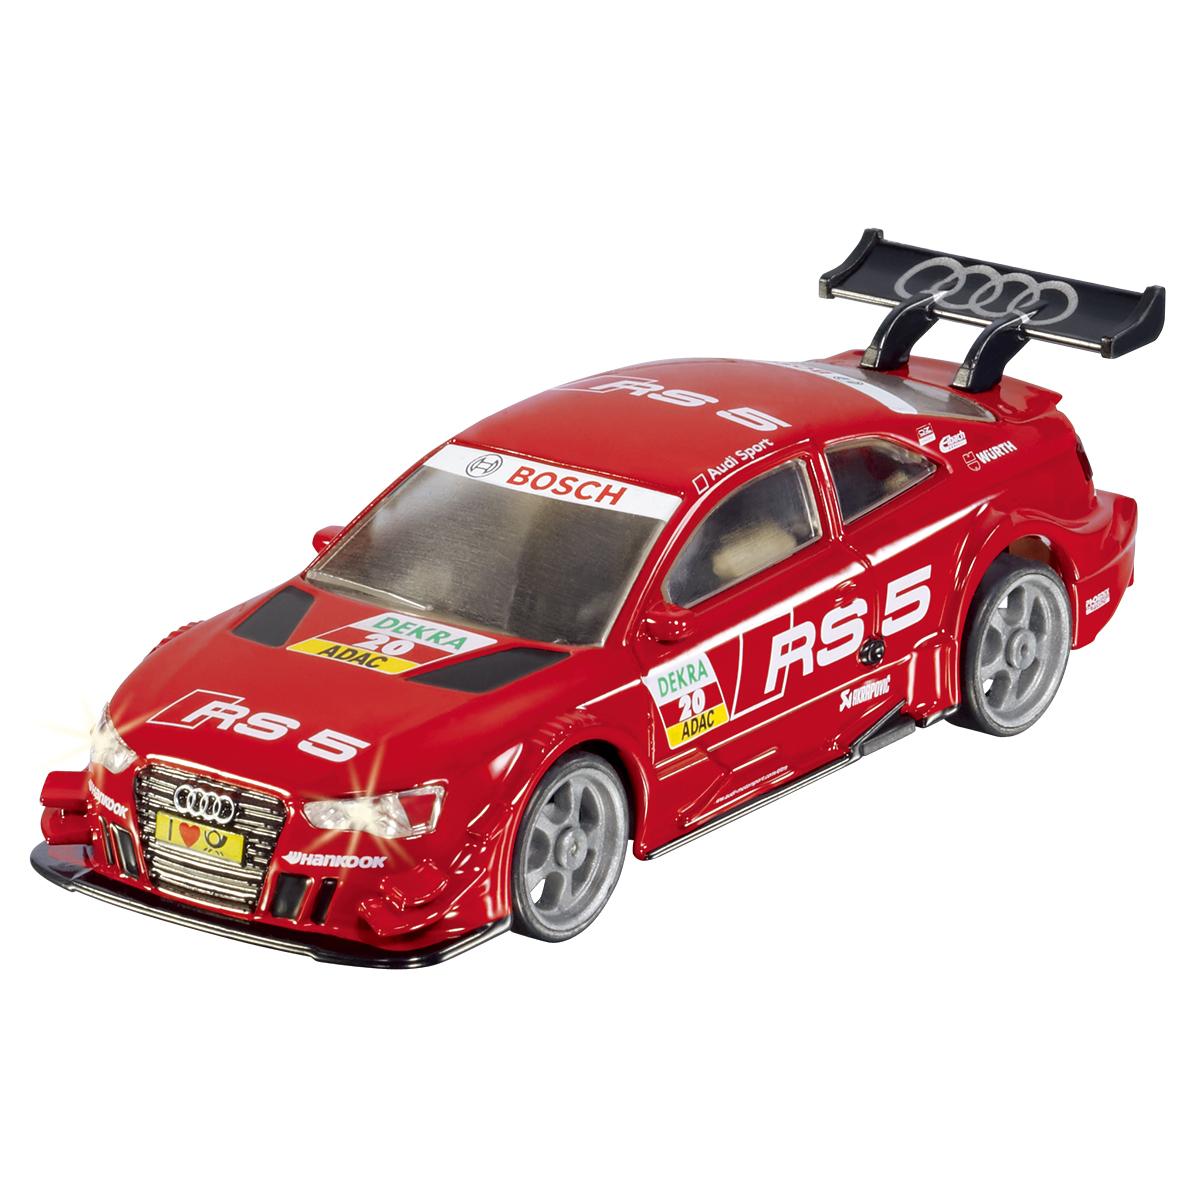 SIKU RACING アウディ RS5 -セット (ジク・SIKU)